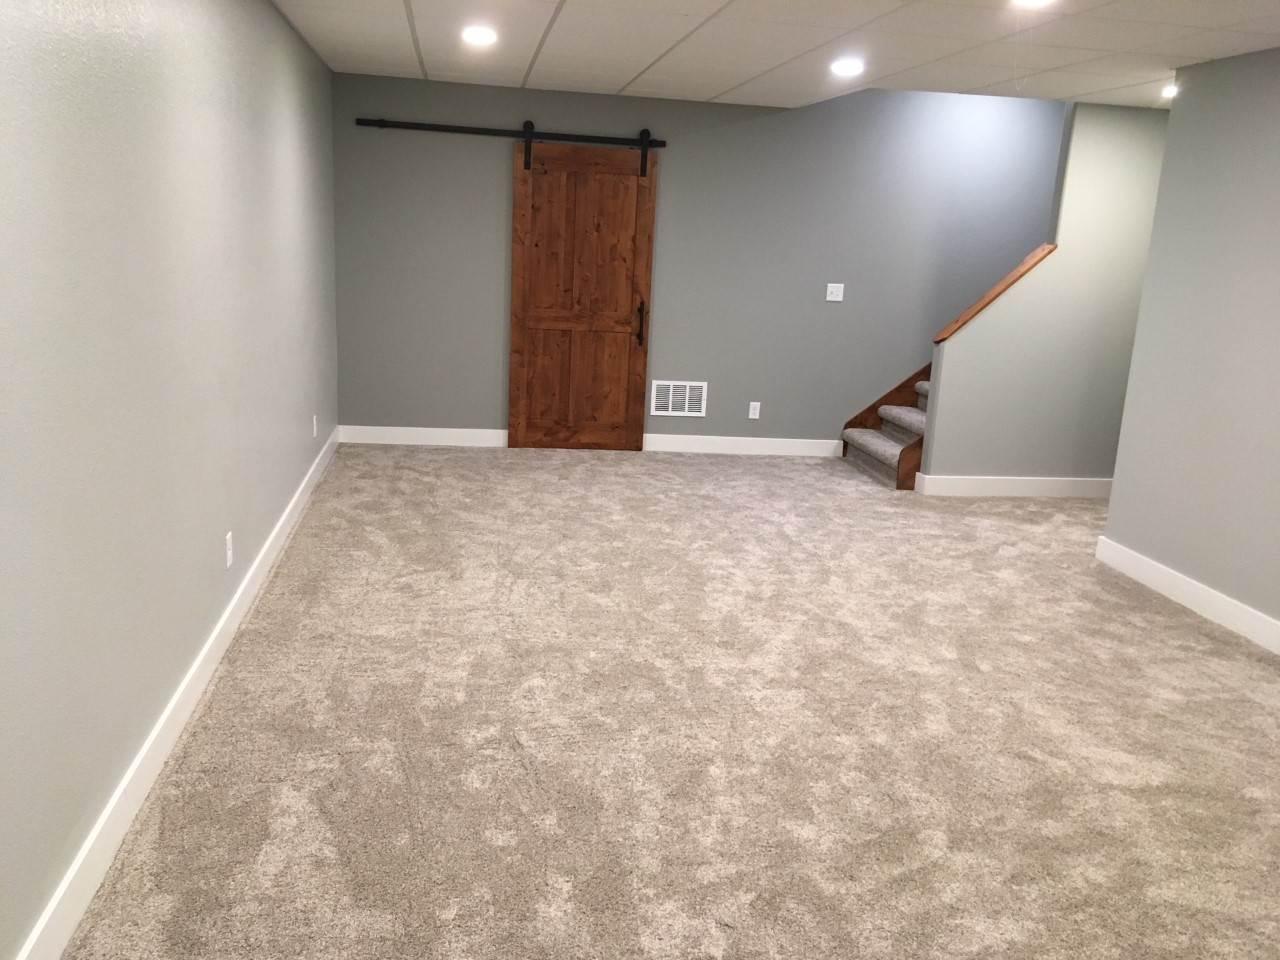 For Sale: 409 N Park, Stafford KS